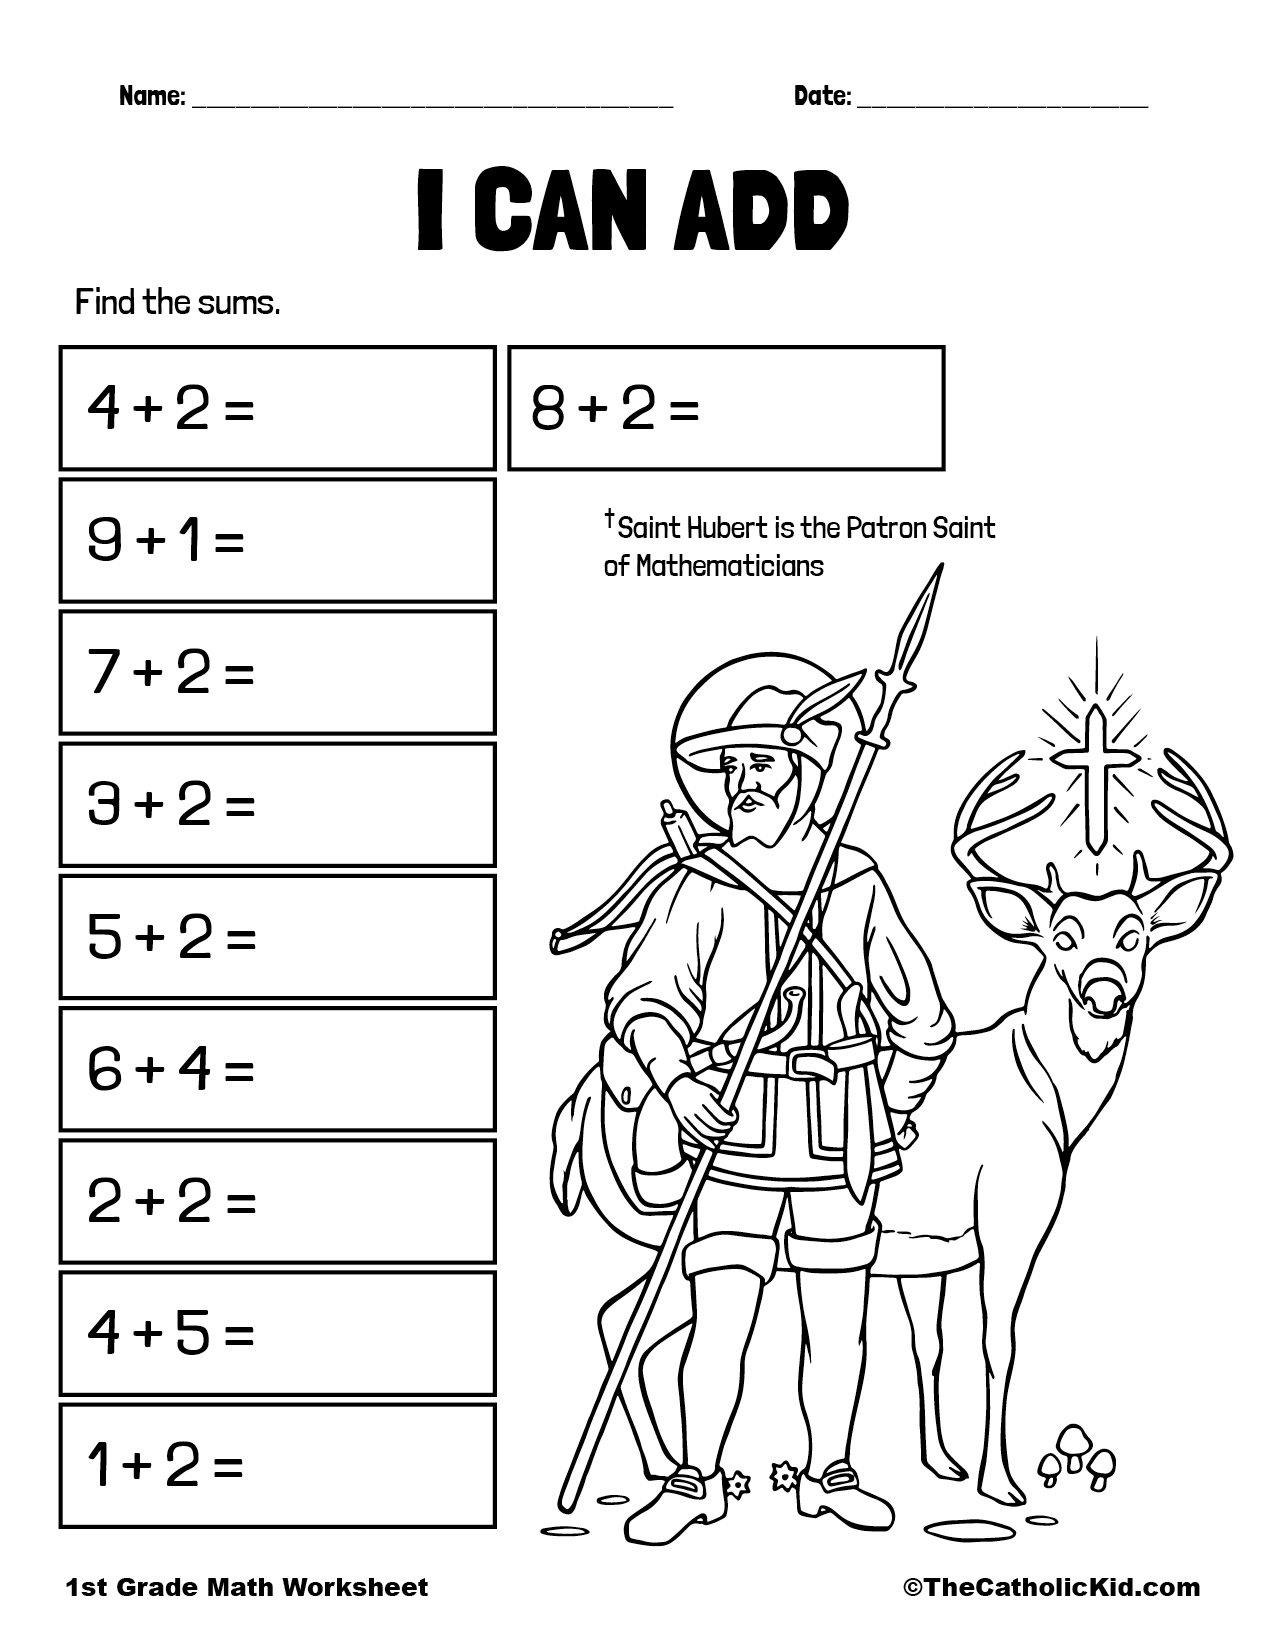 Find the Sums - 1st Grade Math Worksheet Catholic